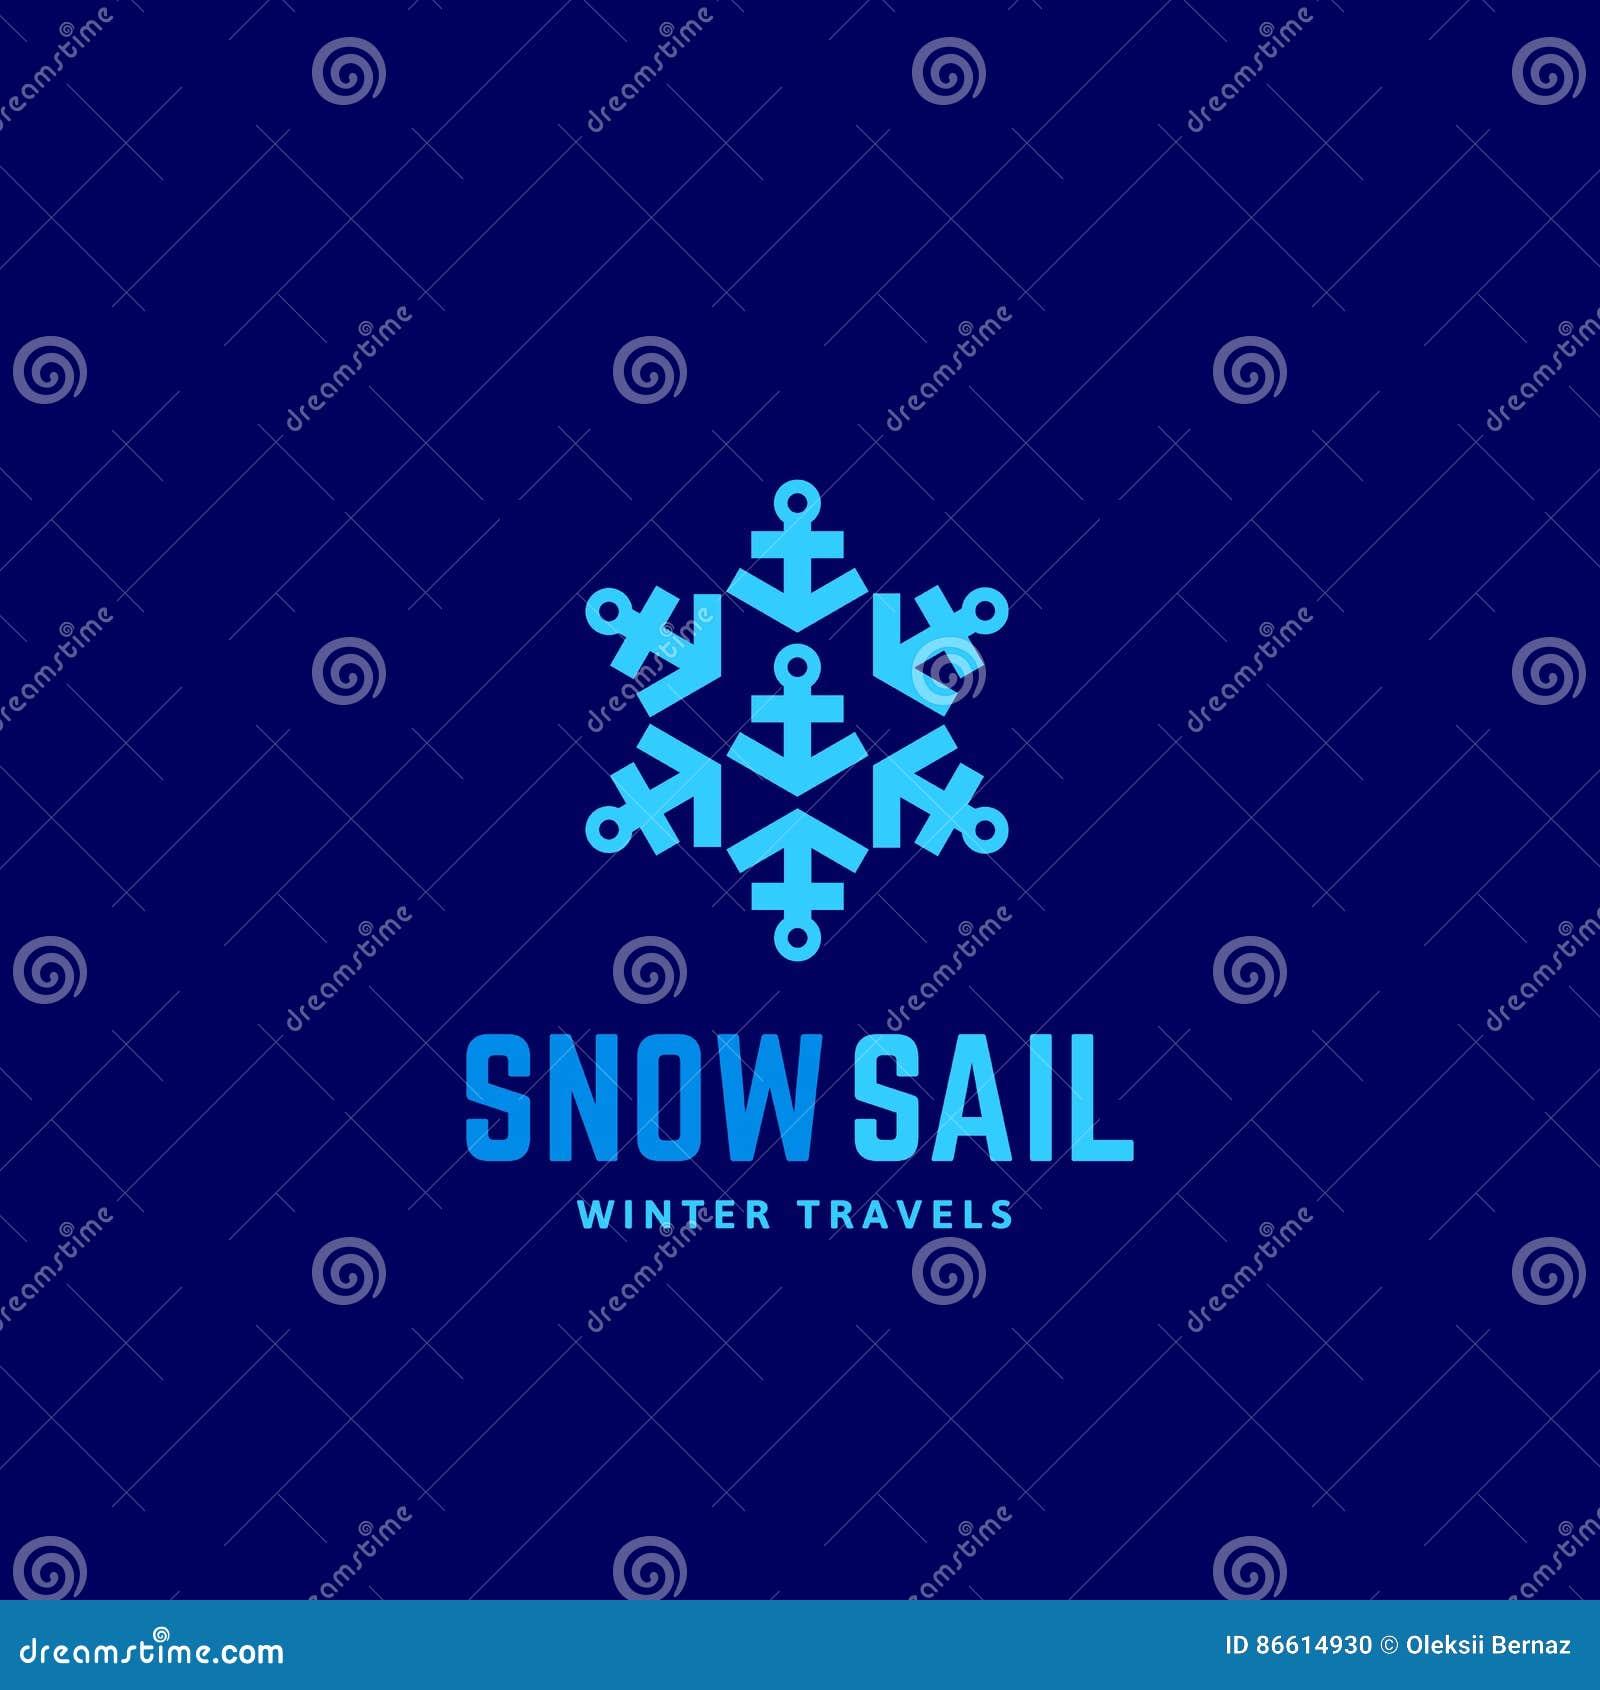 Snow Sail Winter Travels Abstract Vector Sign Emblem Or Logo